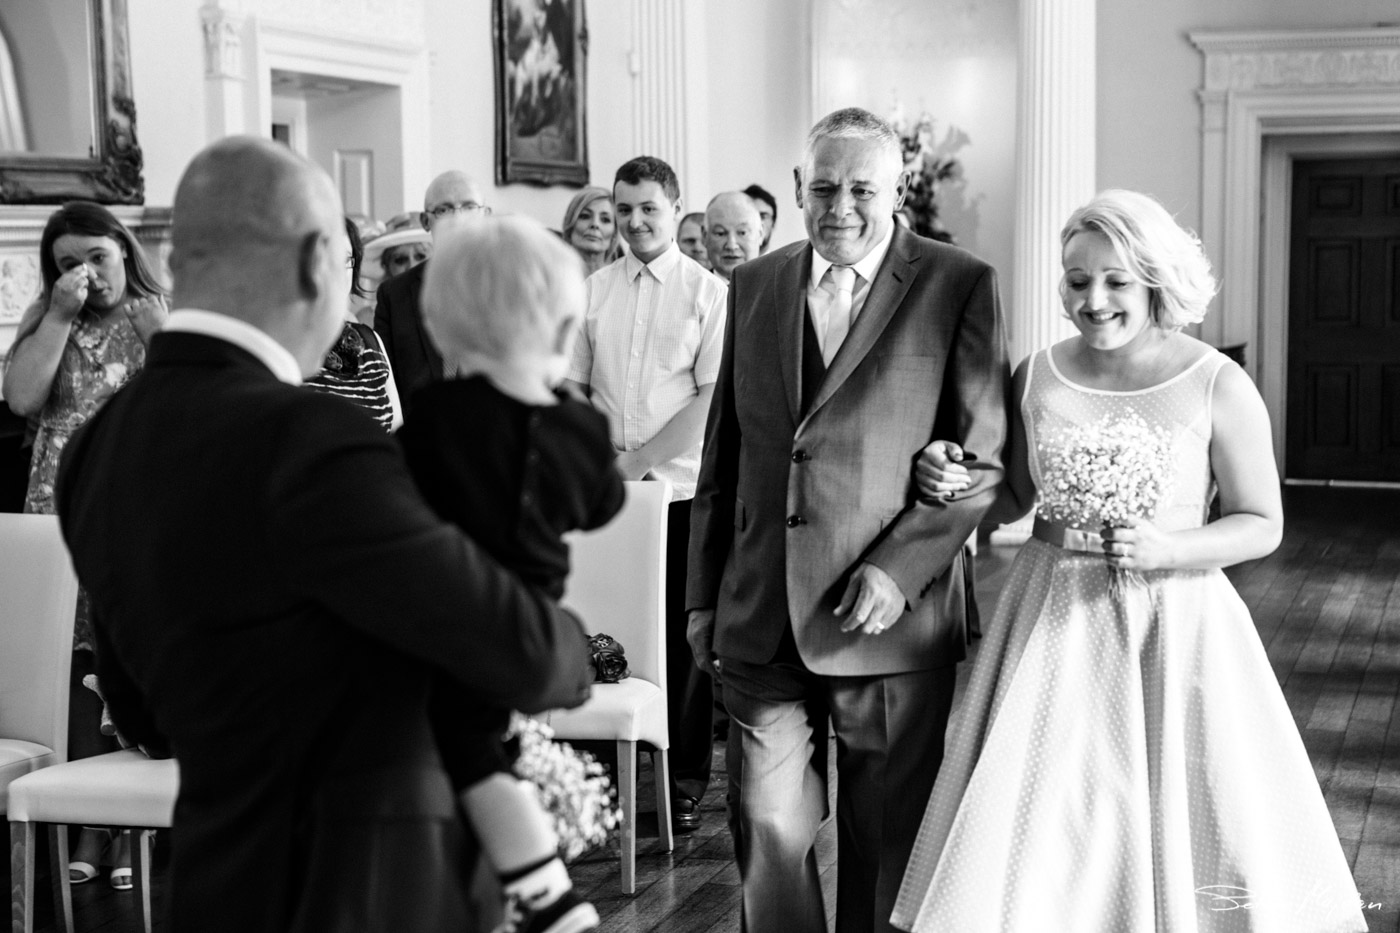 Colwick-hall-wedding-photography-17.jpg